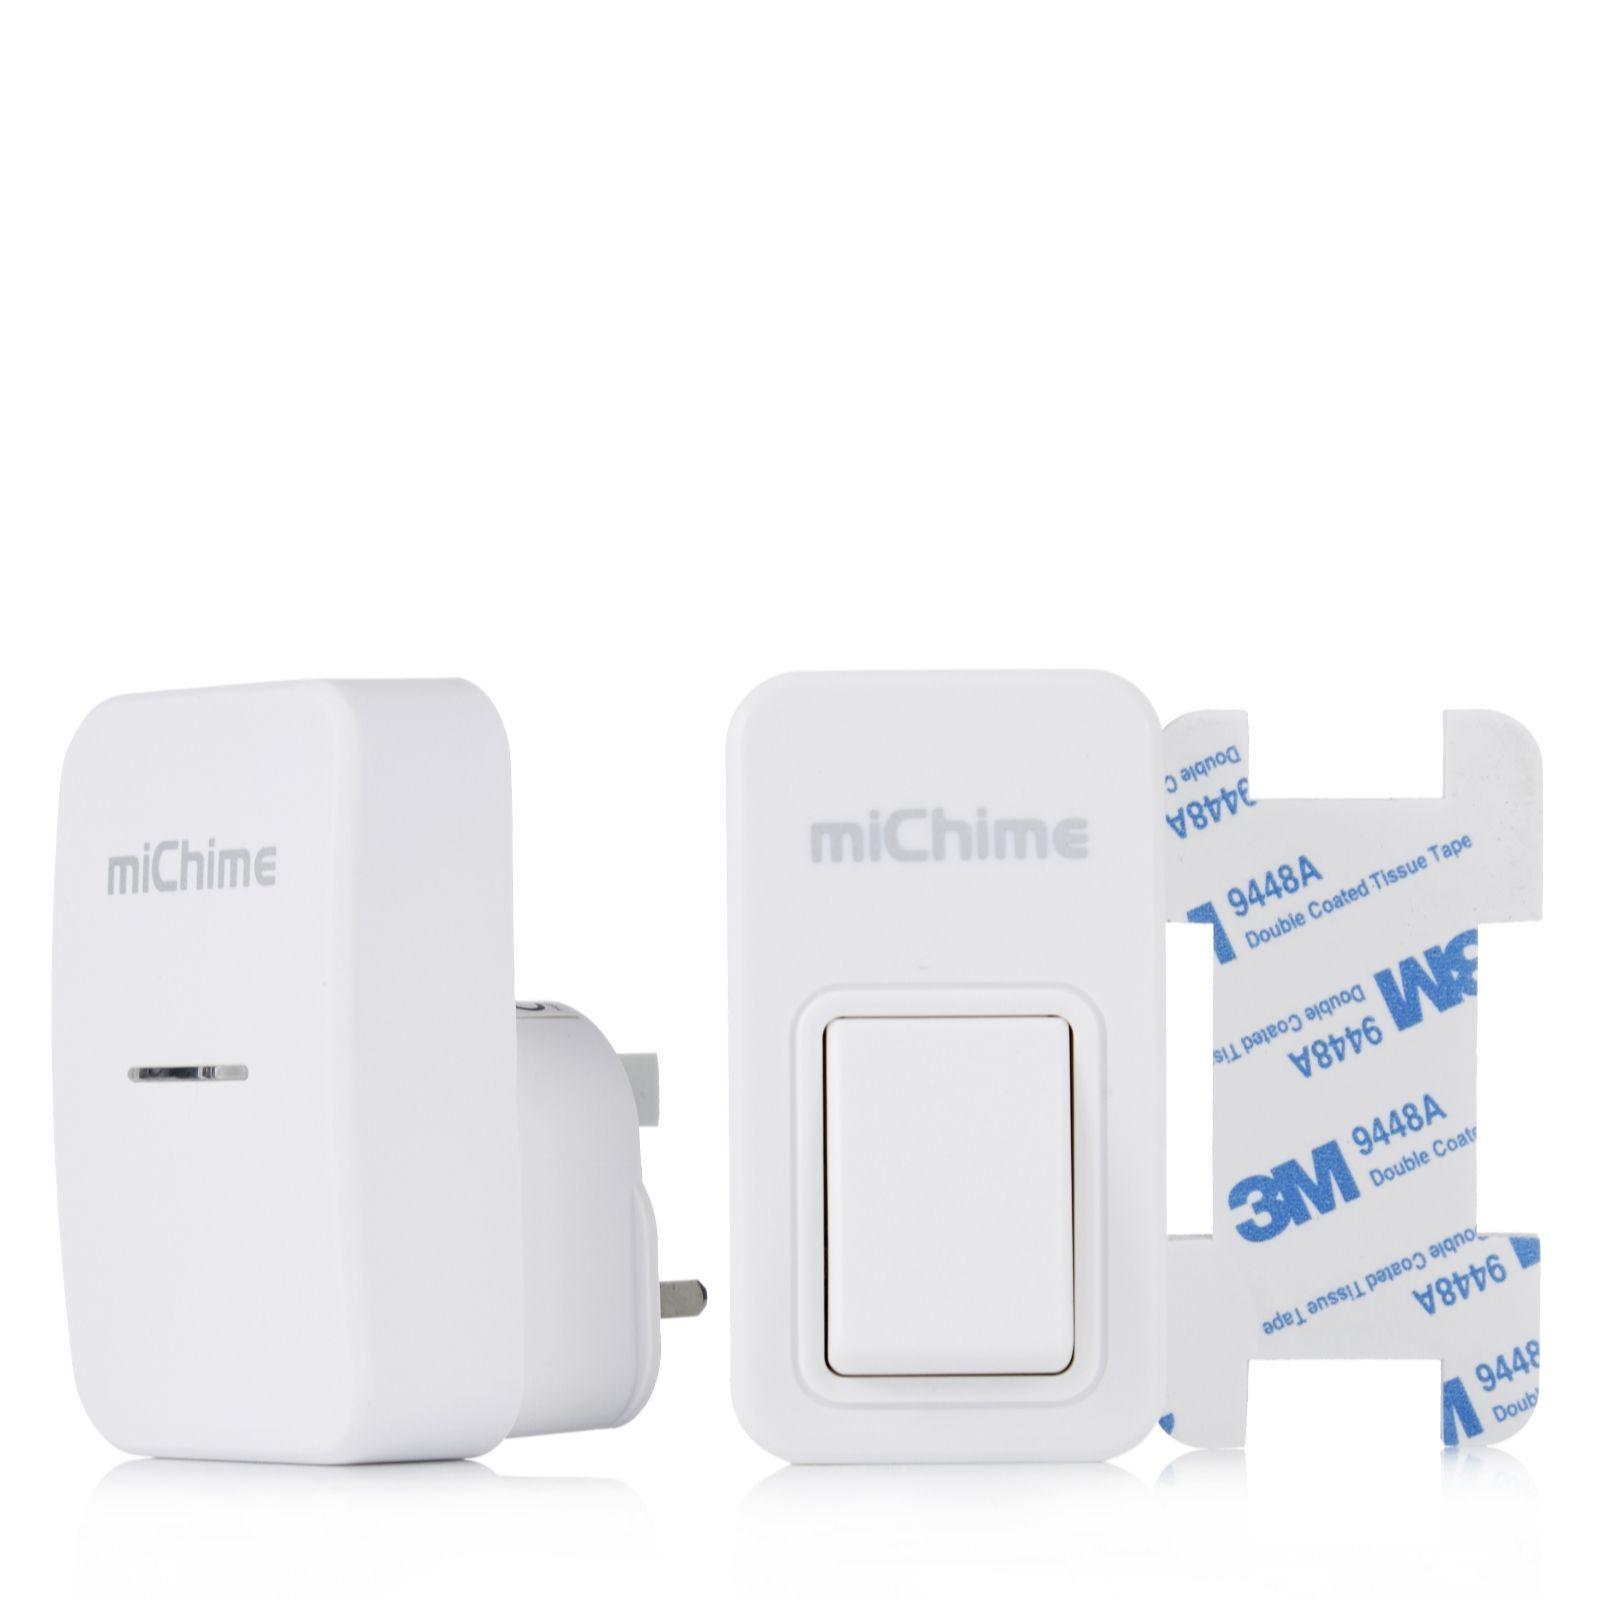 ERA miChime Batteryless Wireless Doorbell Chime &